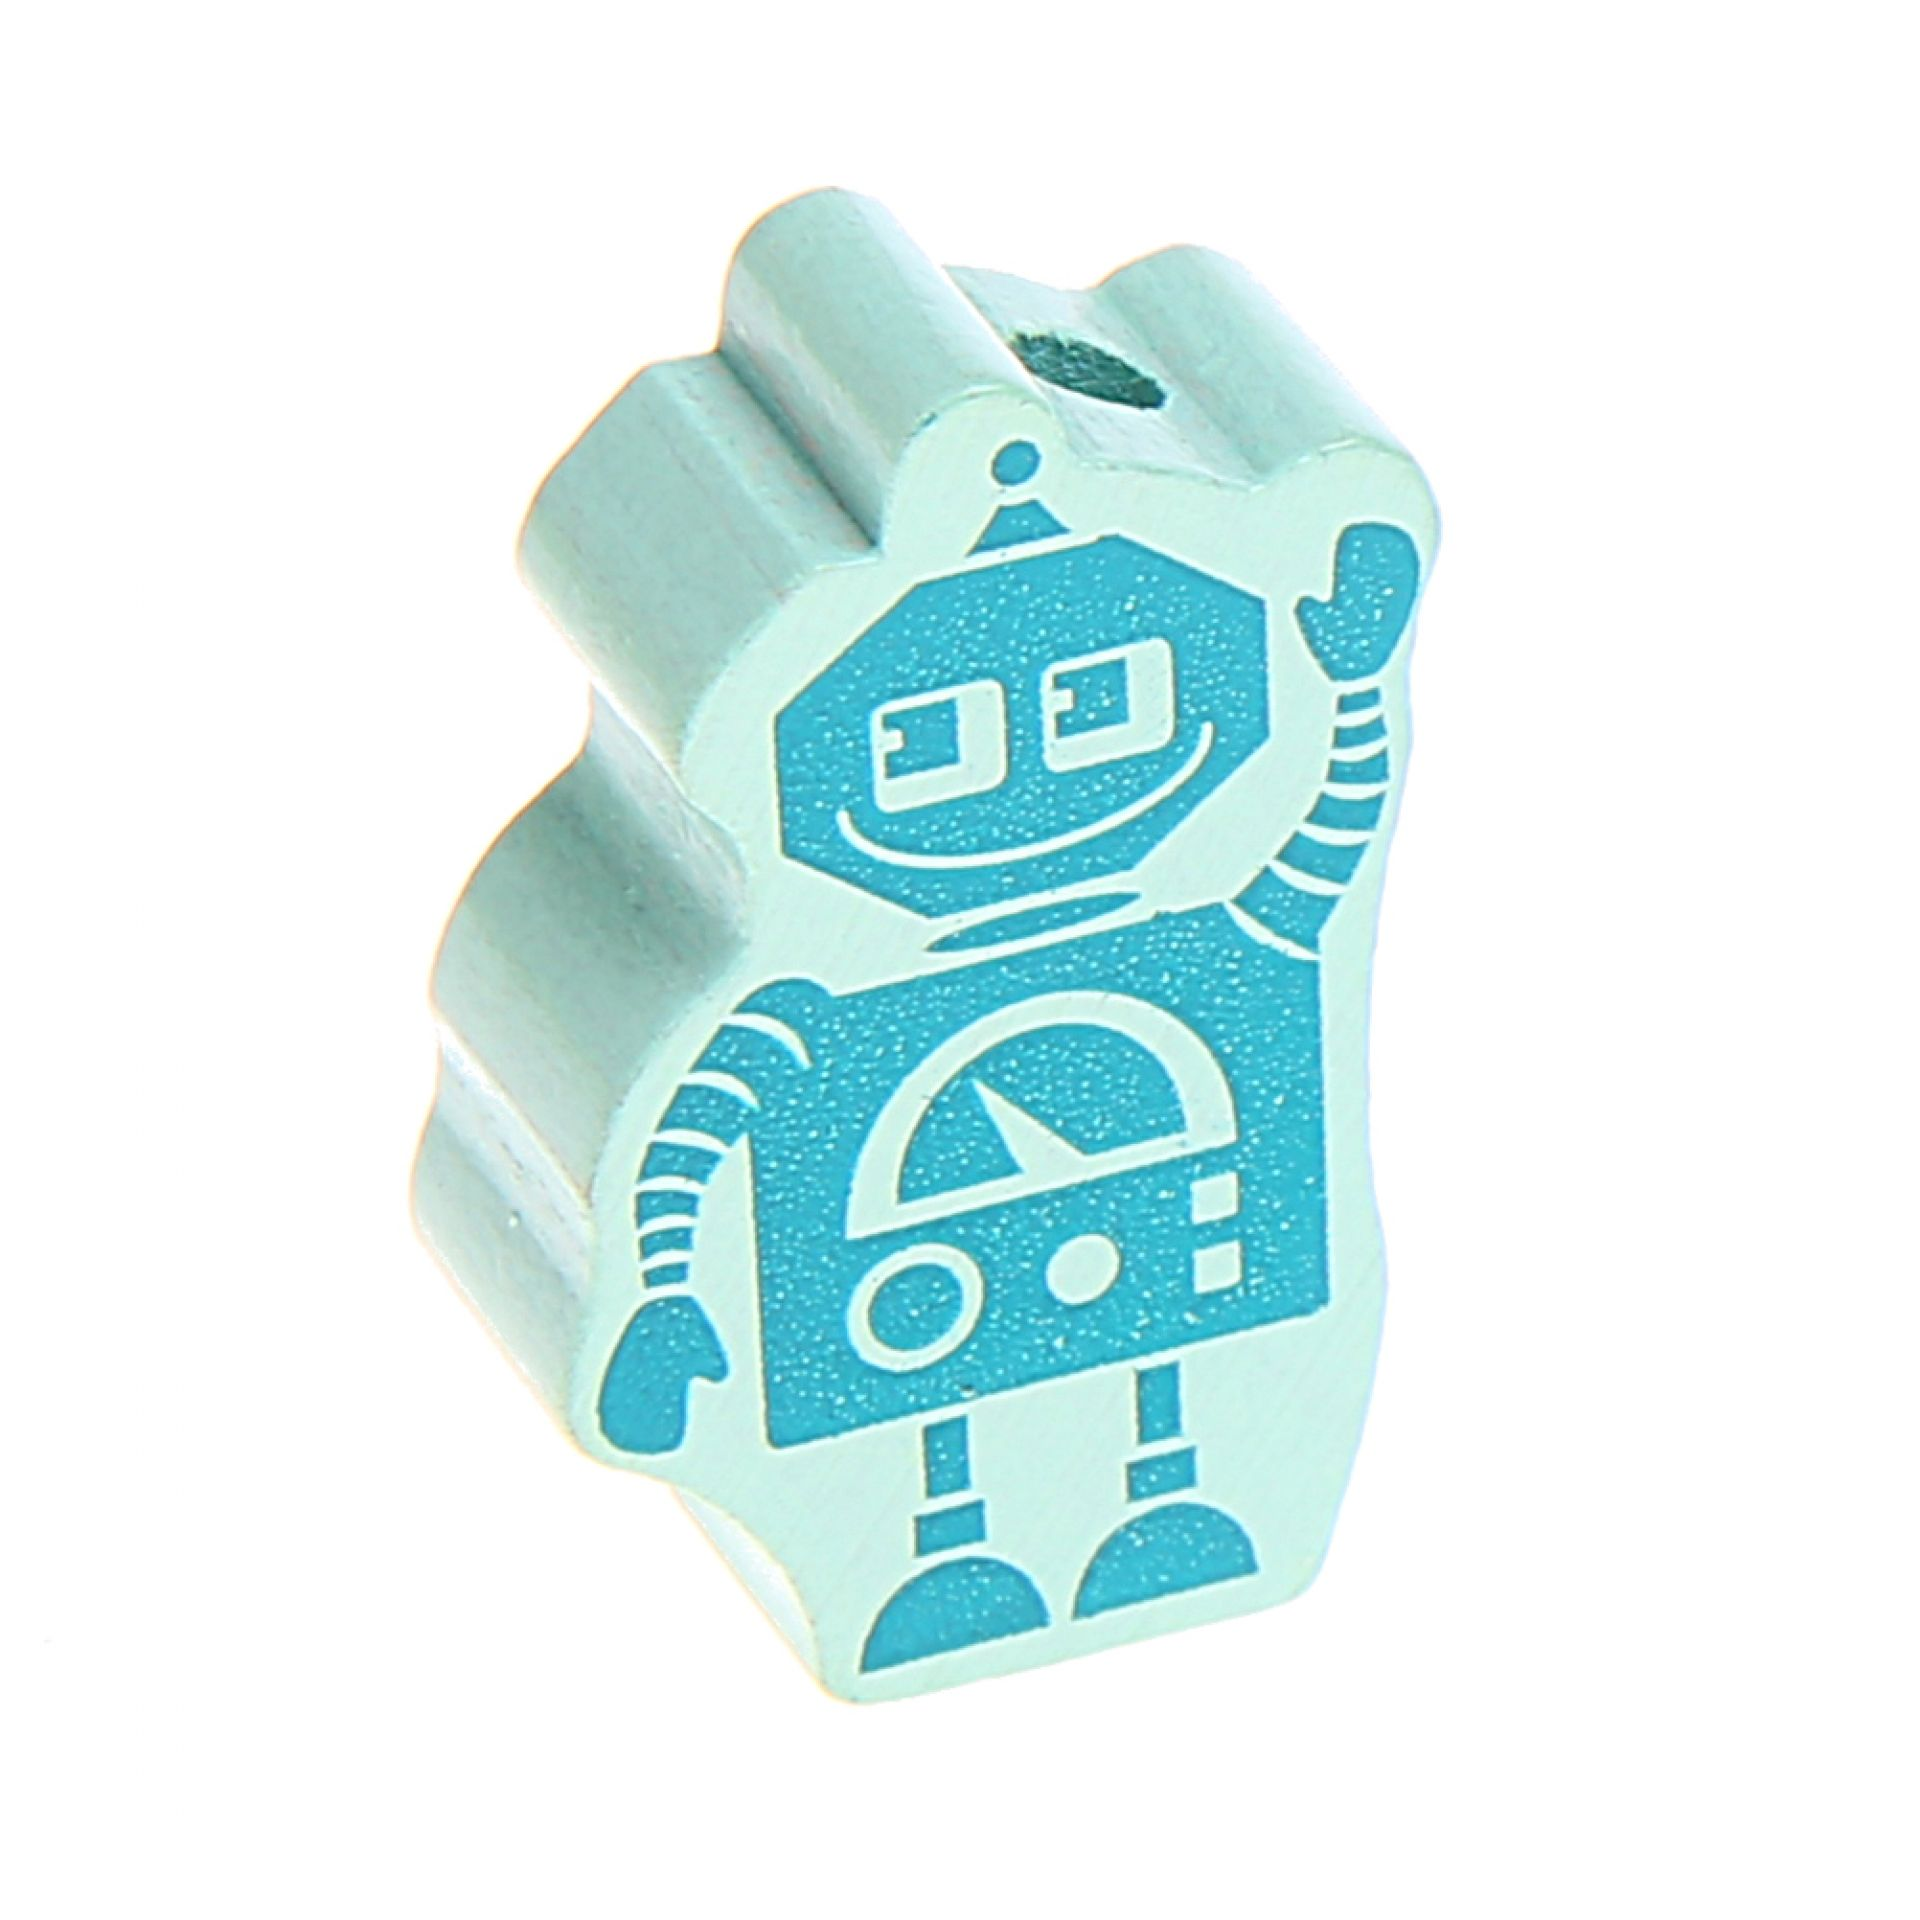 Motivperle Roboter 'mint' 894 auf Lager